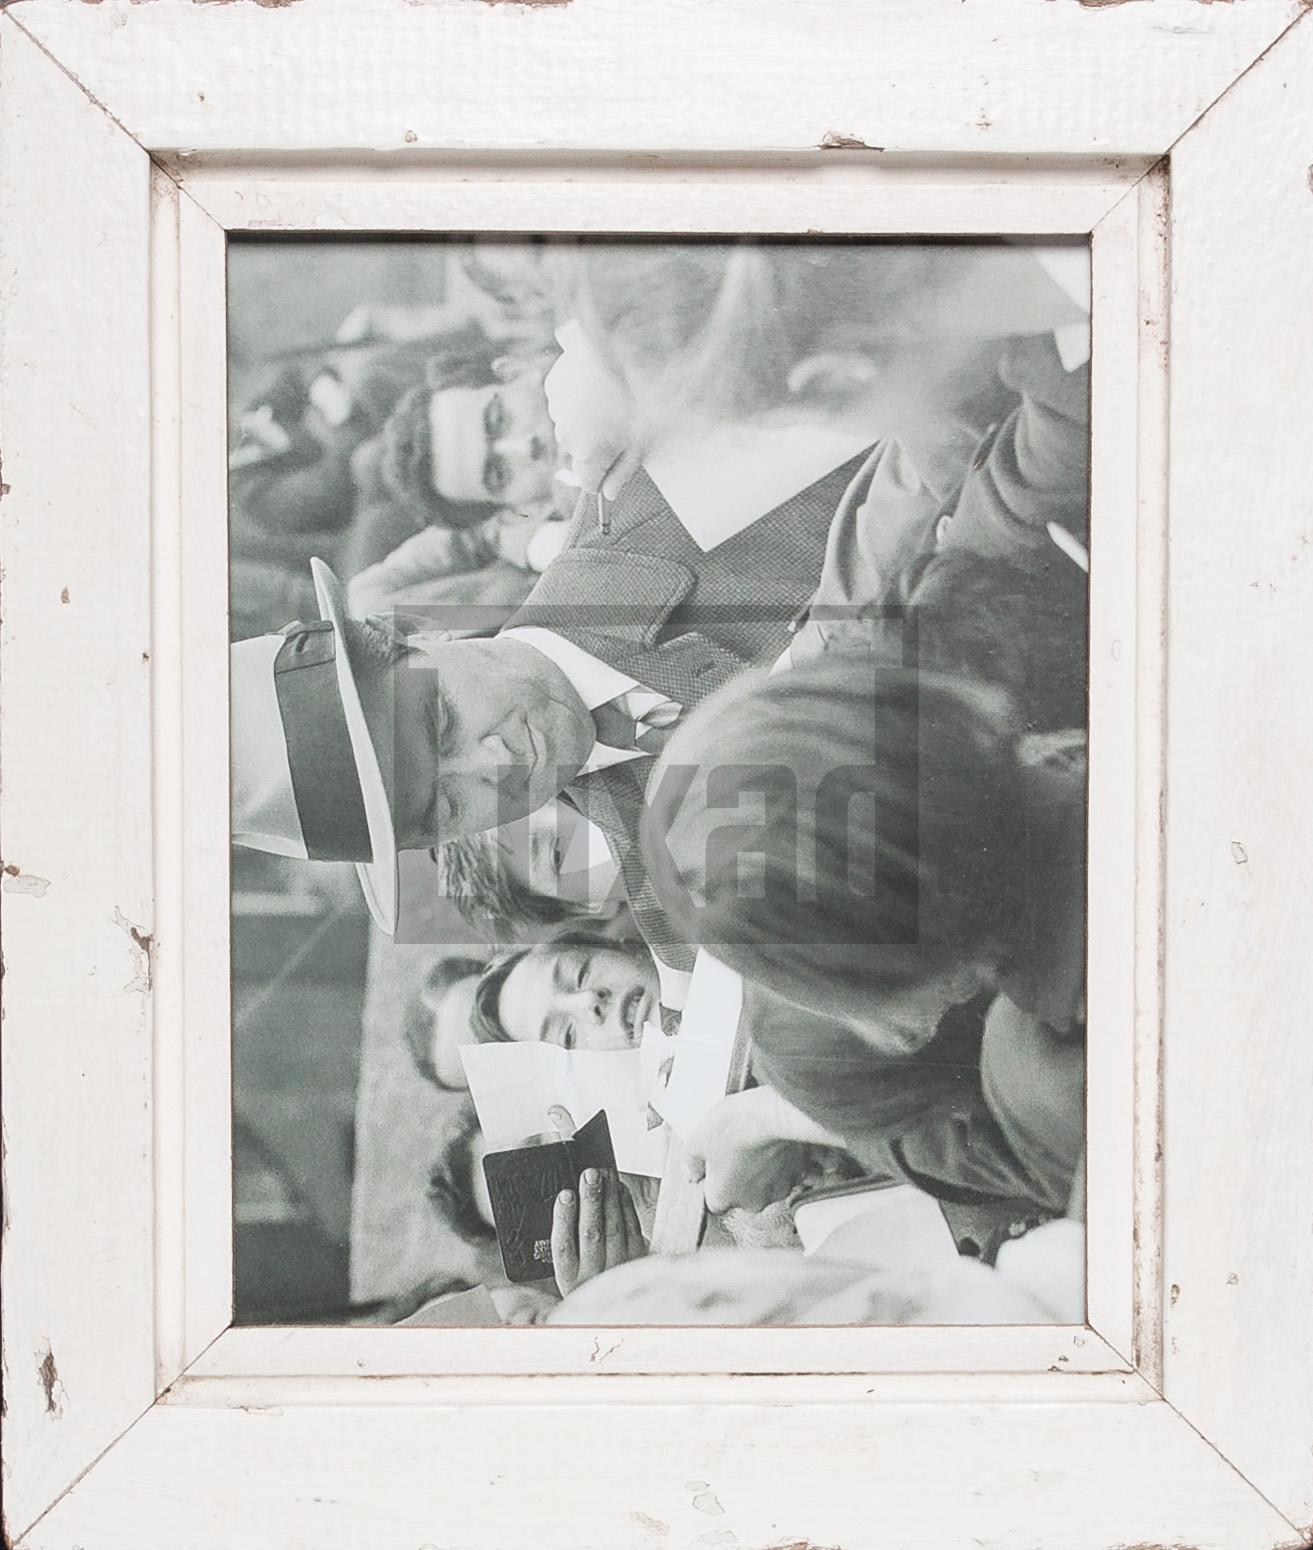 Holzbilderrahmen für Fotos 20 x 25 cm